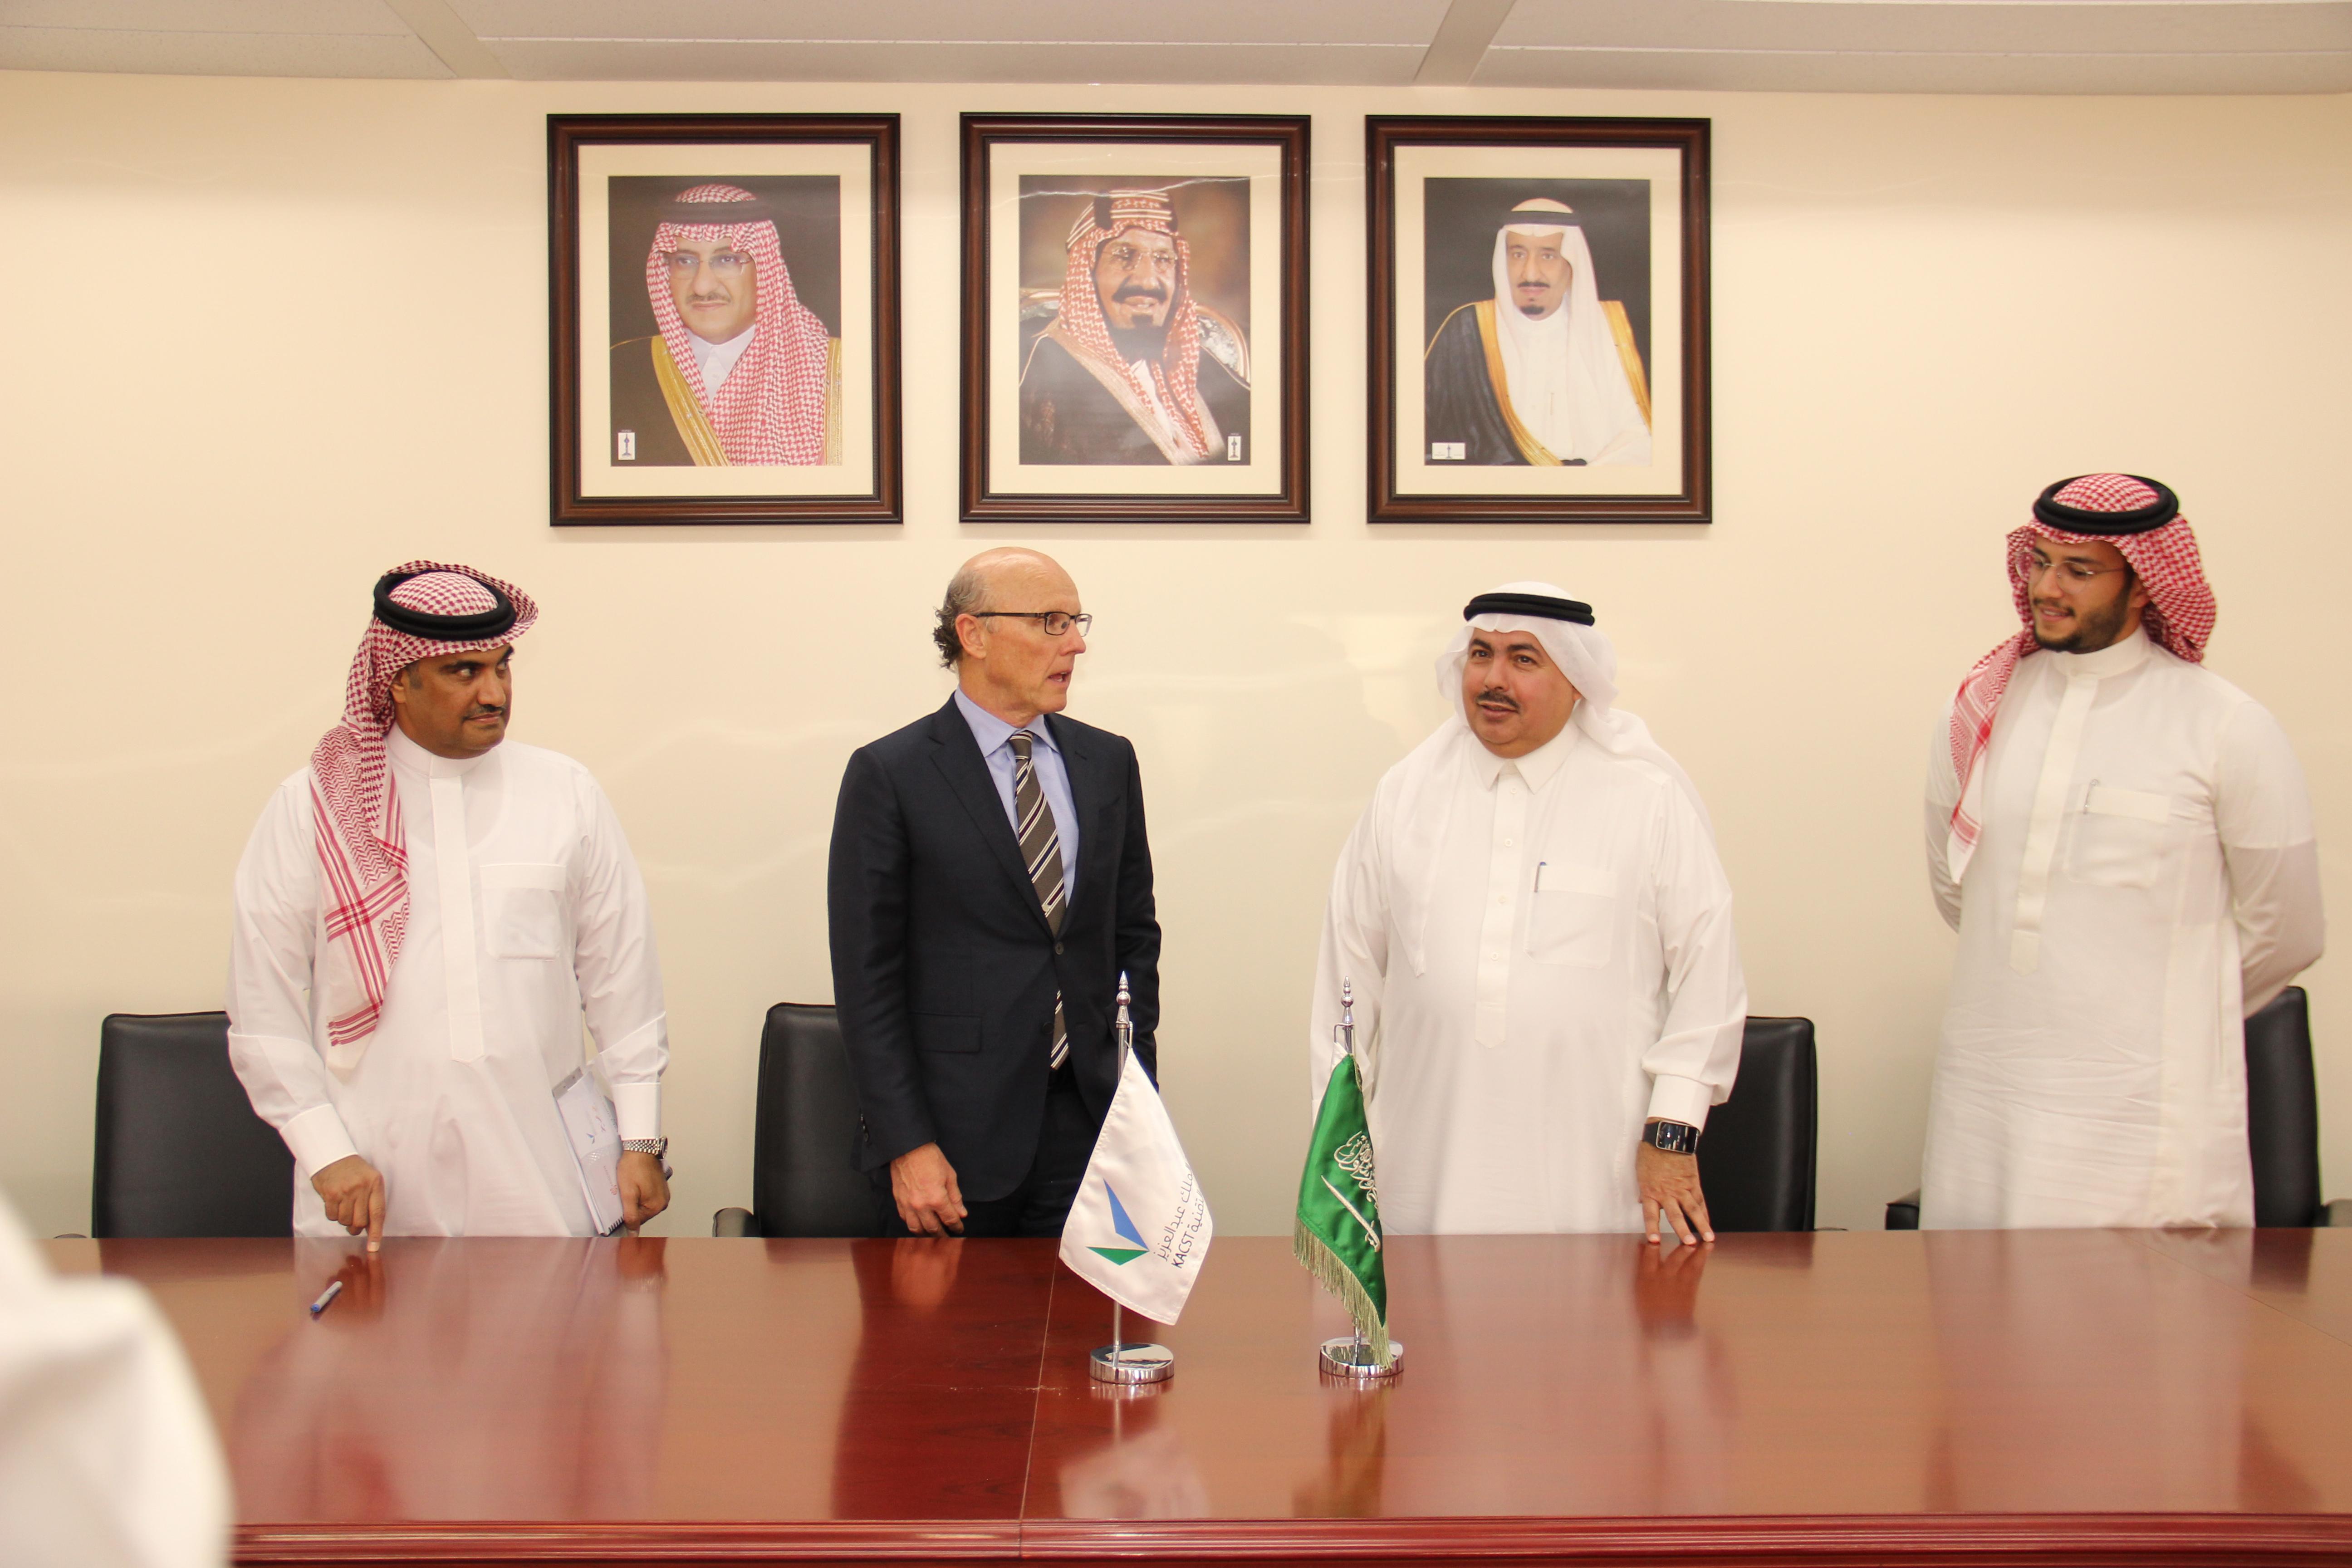 left is Eng Adbullah Al-Osaimi followed by David McCourt, then HH Dr. Turki bin Saud and finally Prince Bandar M. Al-Saud